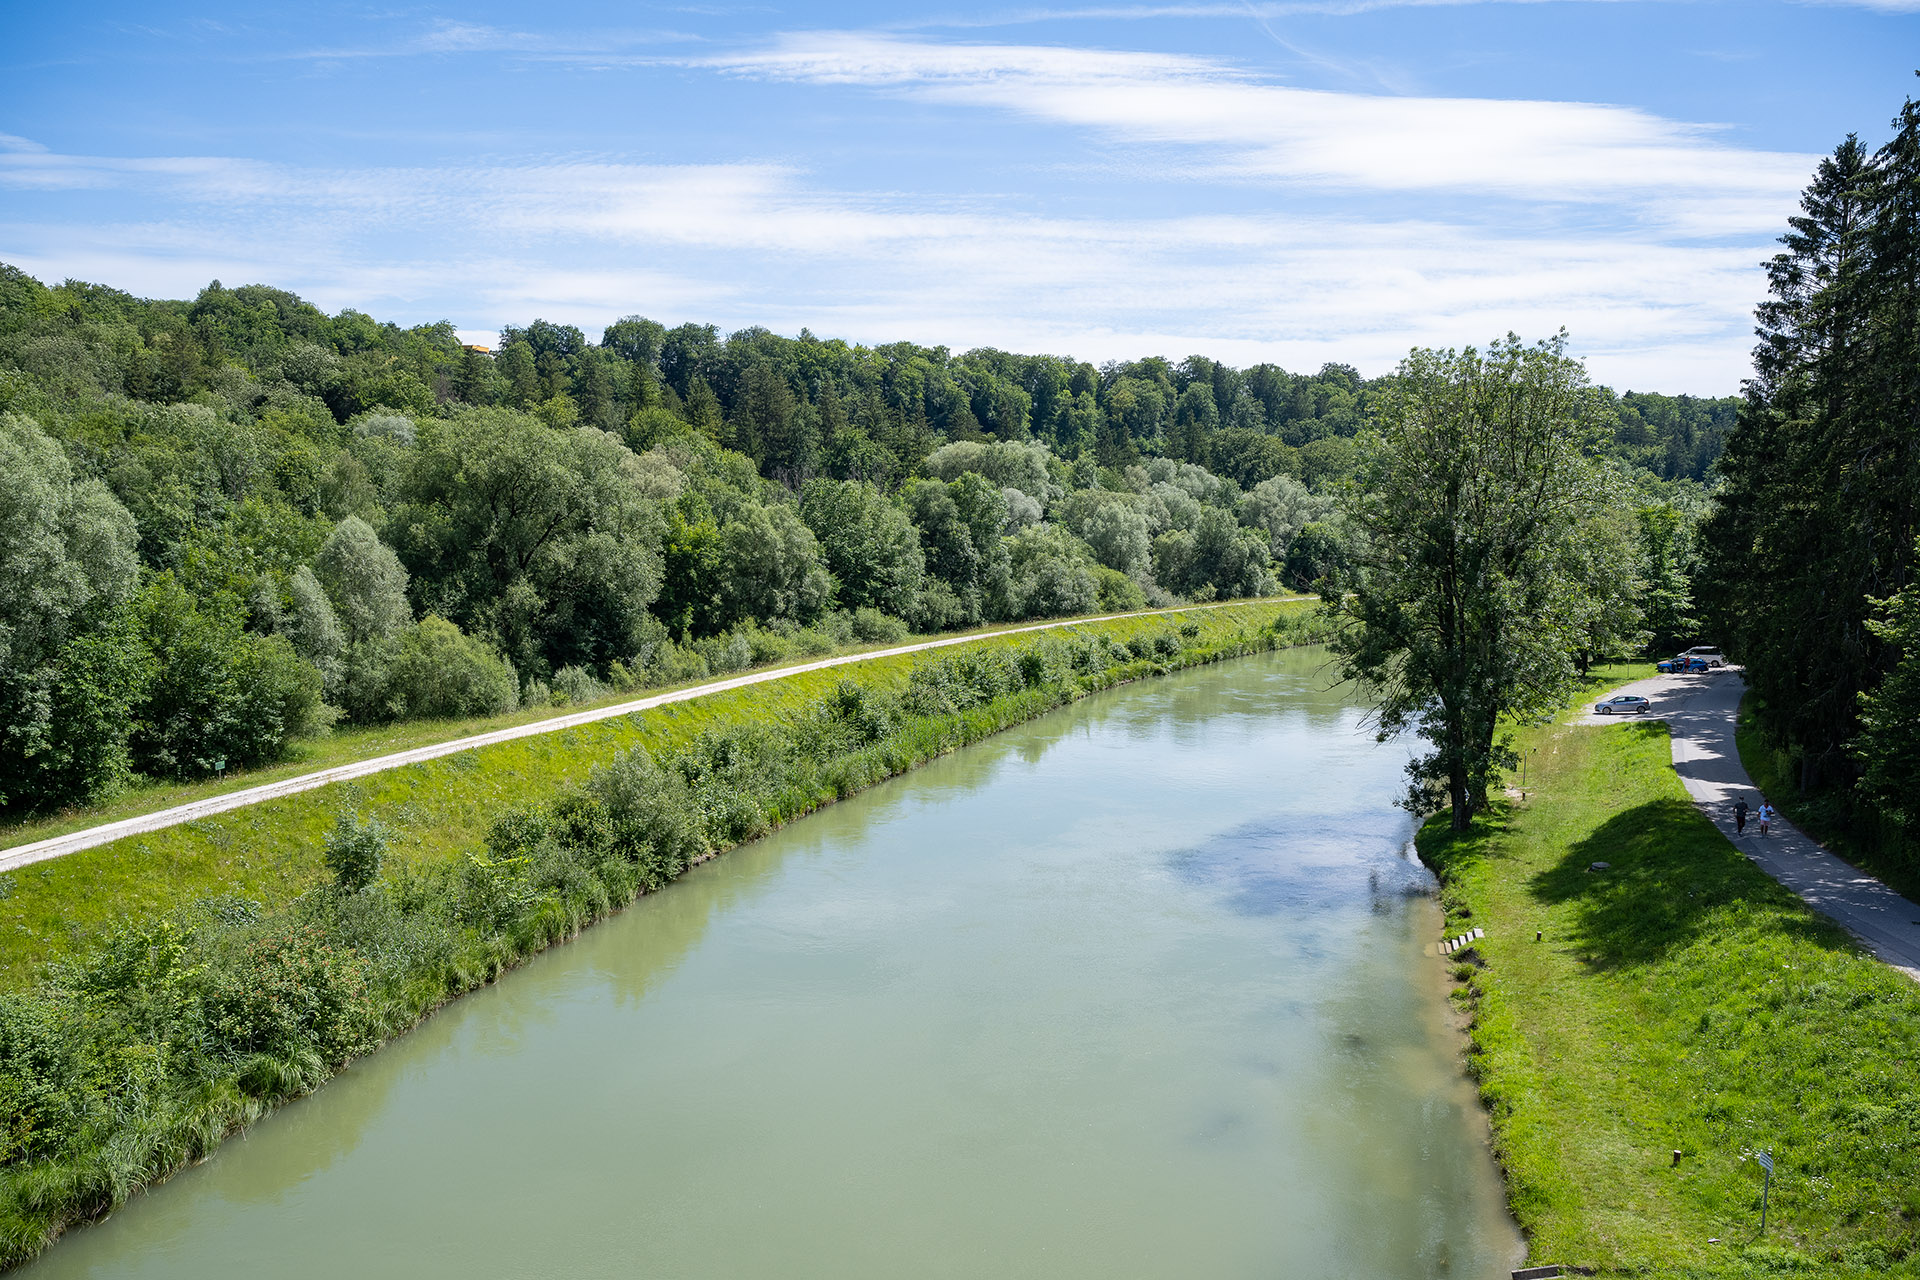 Isar in Grünwald